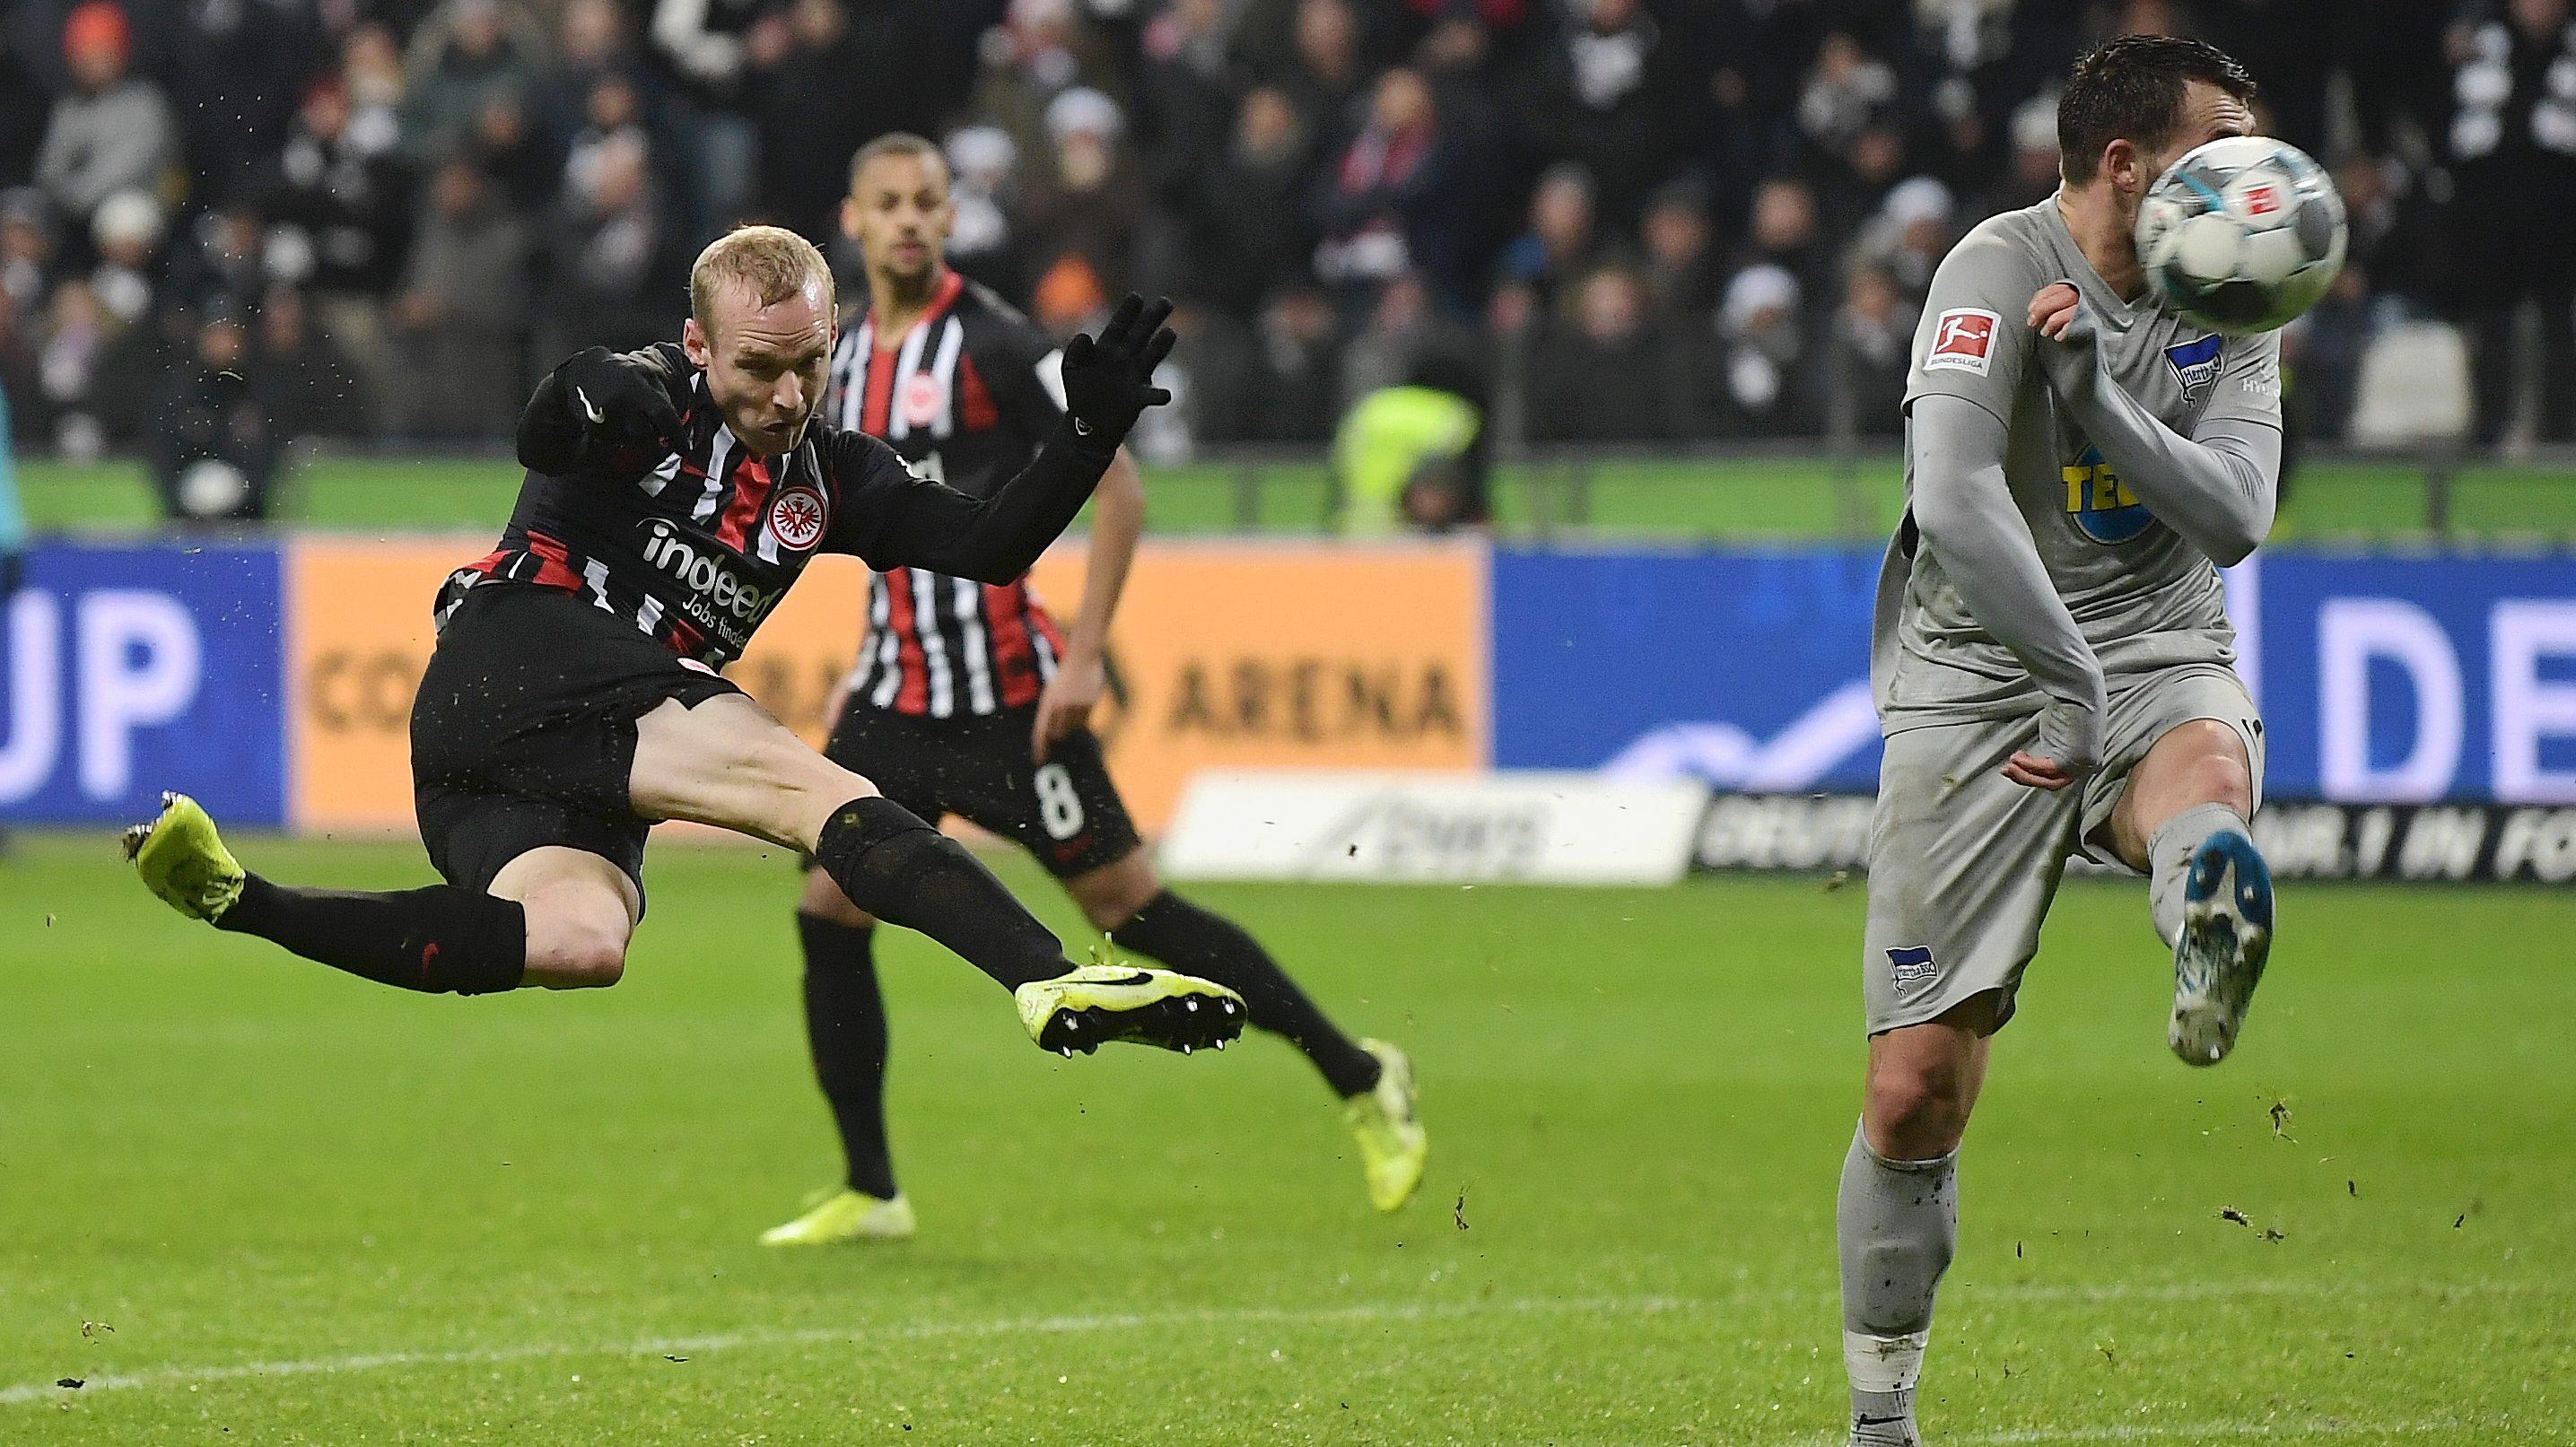 Eagles strike back to deny Klinsmann first Hertha win